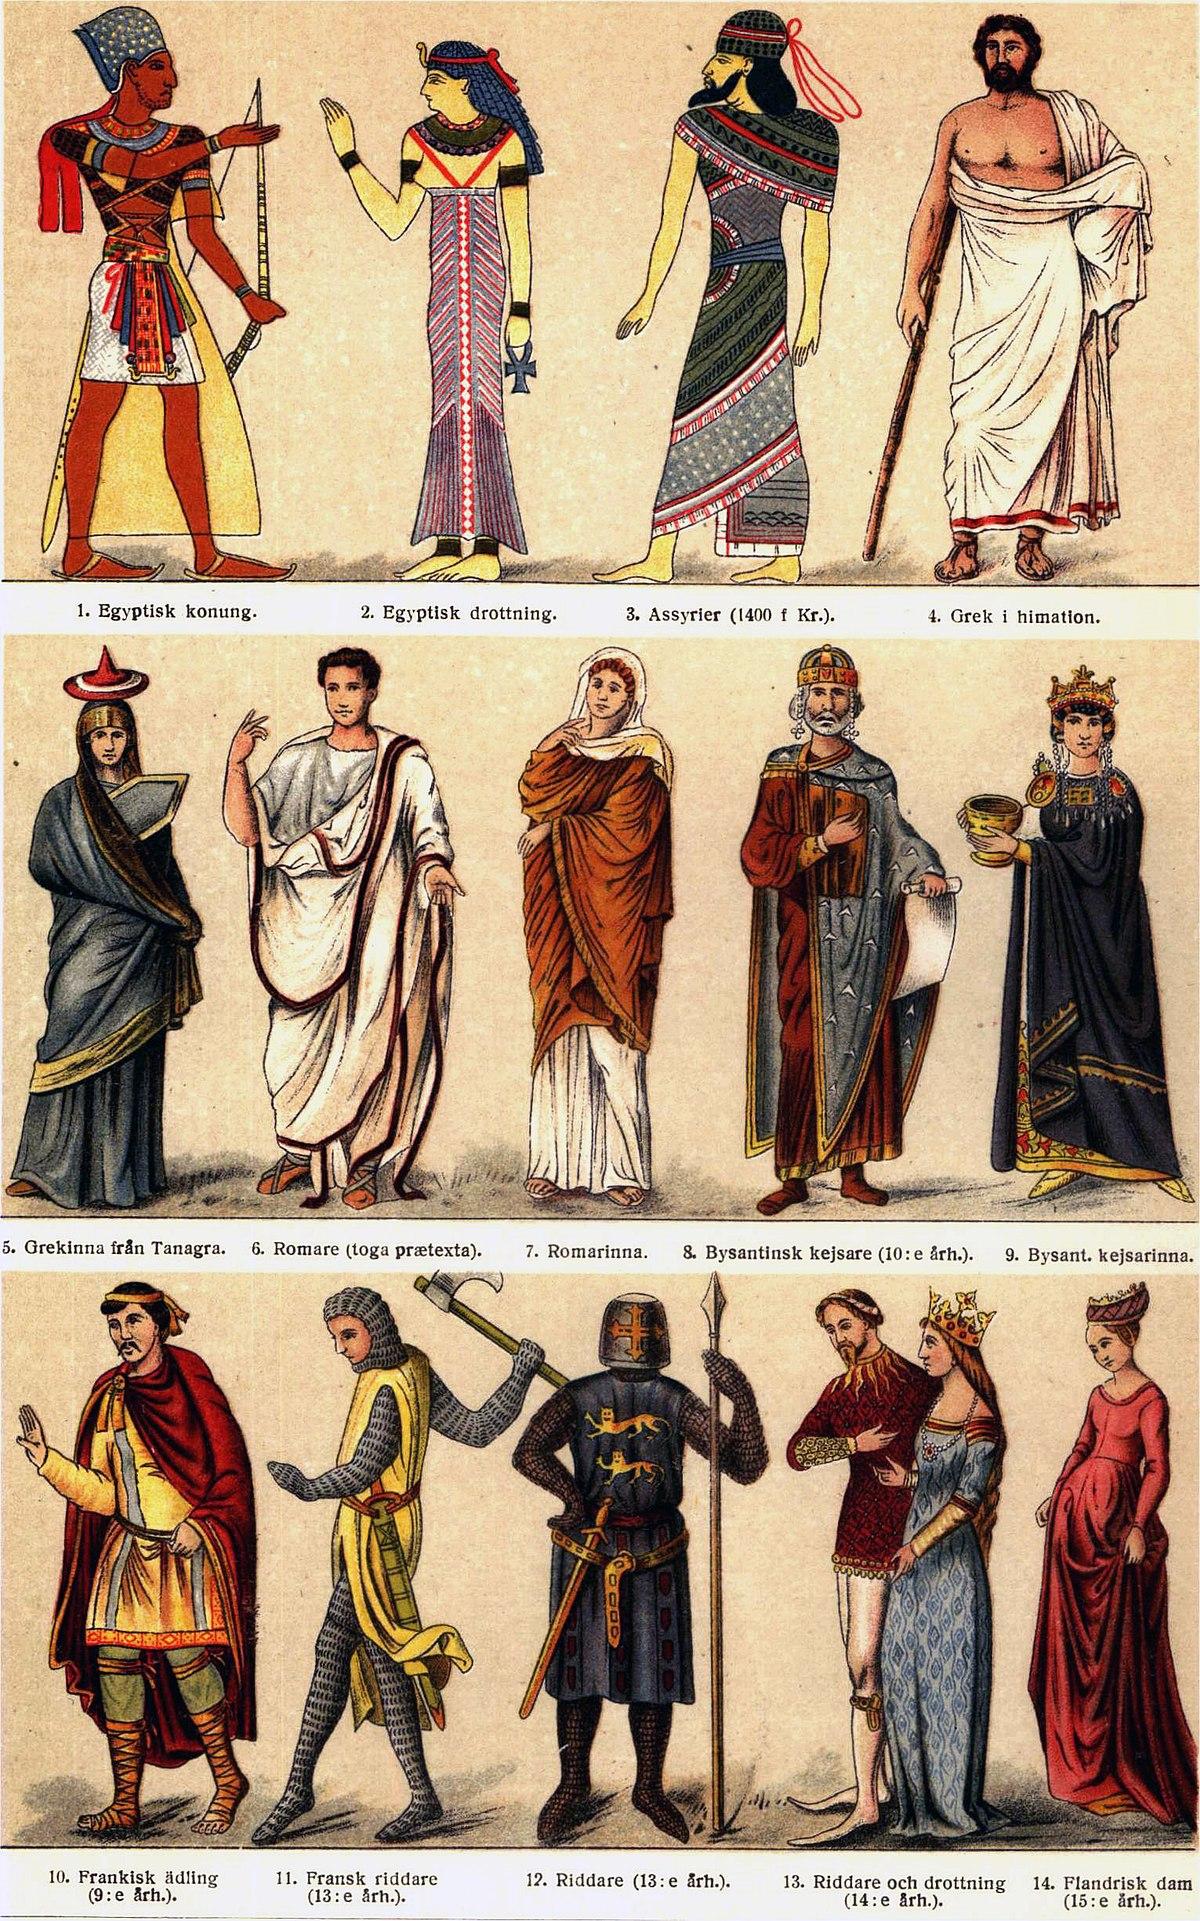 Histoire du costume wikip dia for Histoire des jardins wikipedia